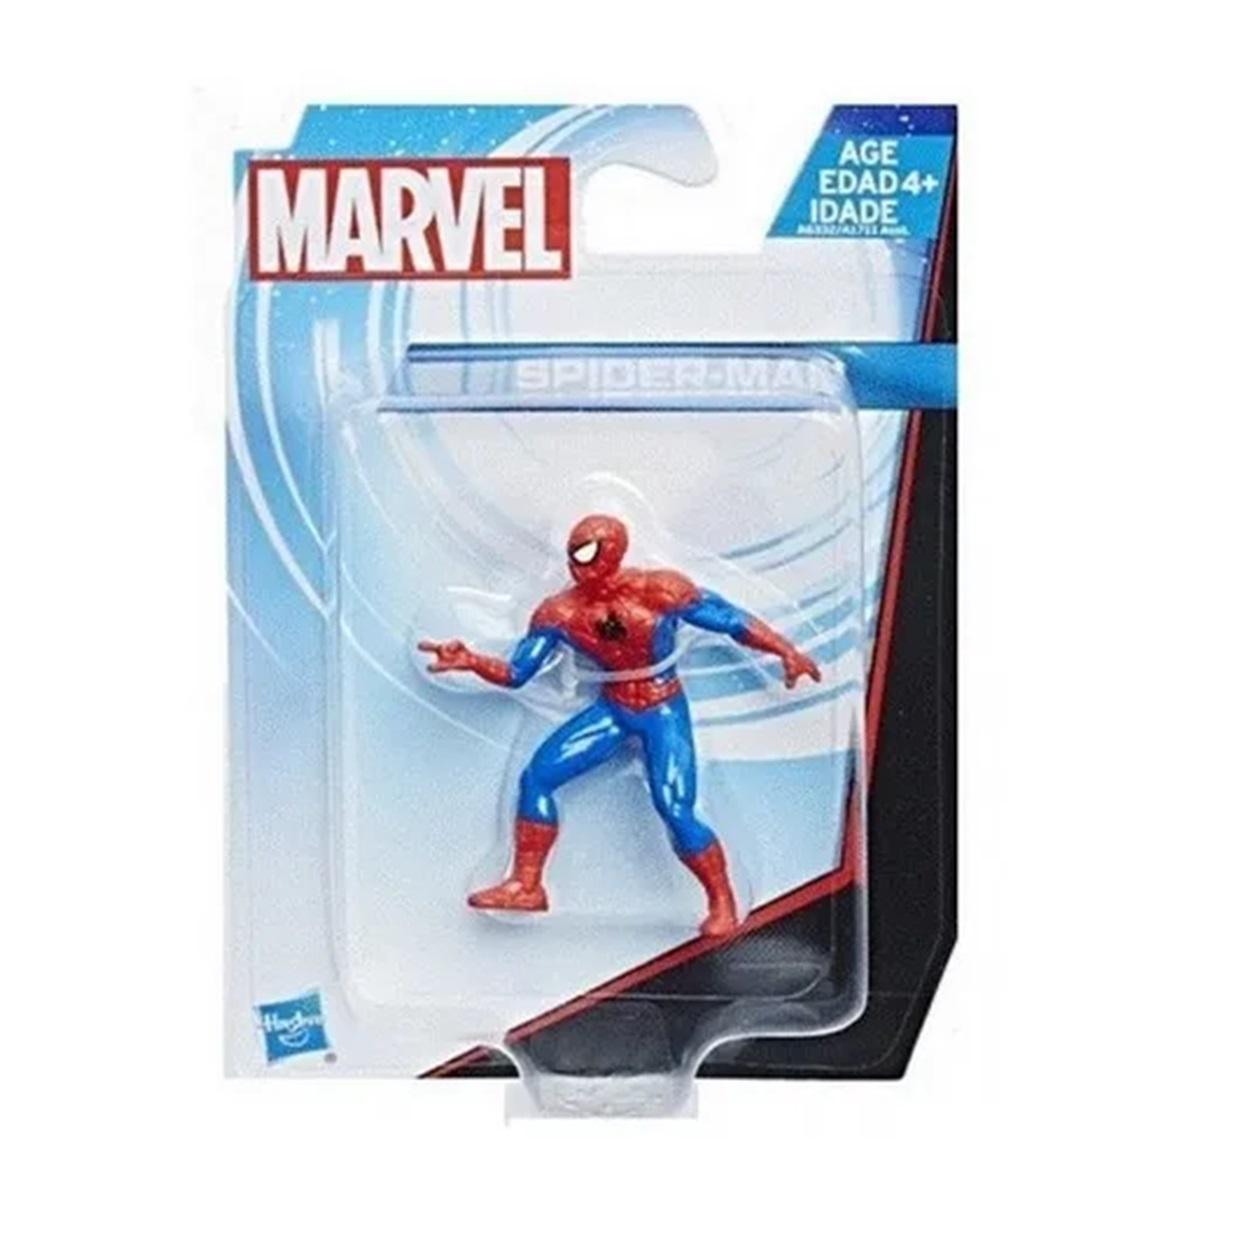 Minifigura Spider Man Marvel 2 Inch Hasbro